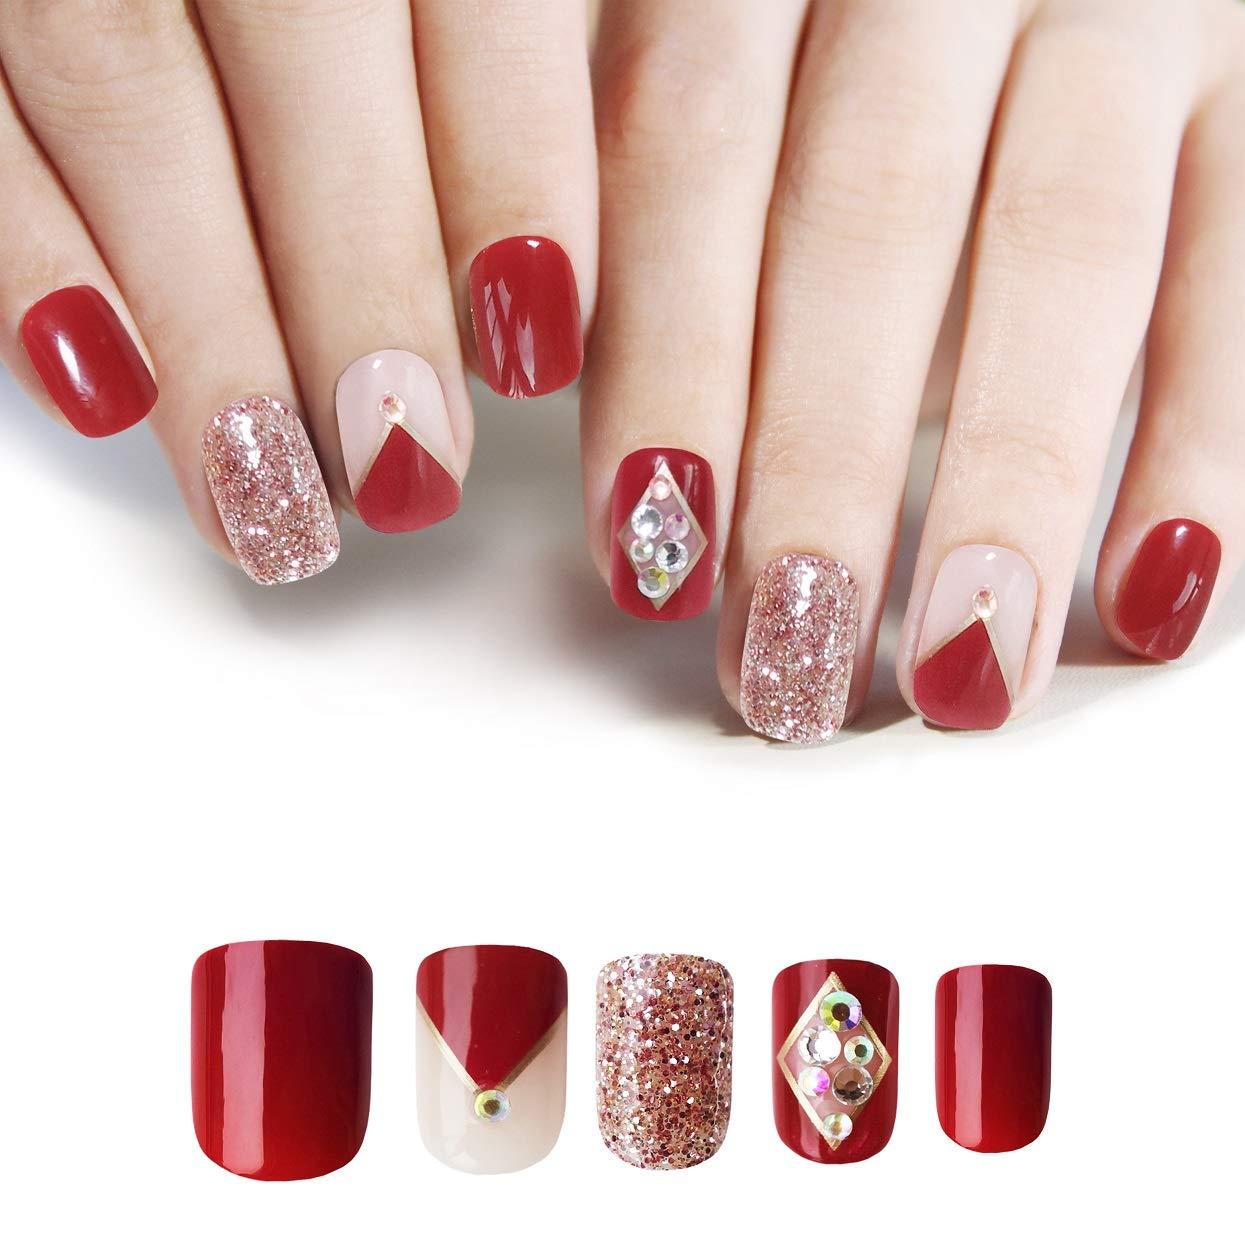 Doreliss False Nails Press On Nails 30 Pcs 3D Bling Glitter Rhinestone with nail tapes Red